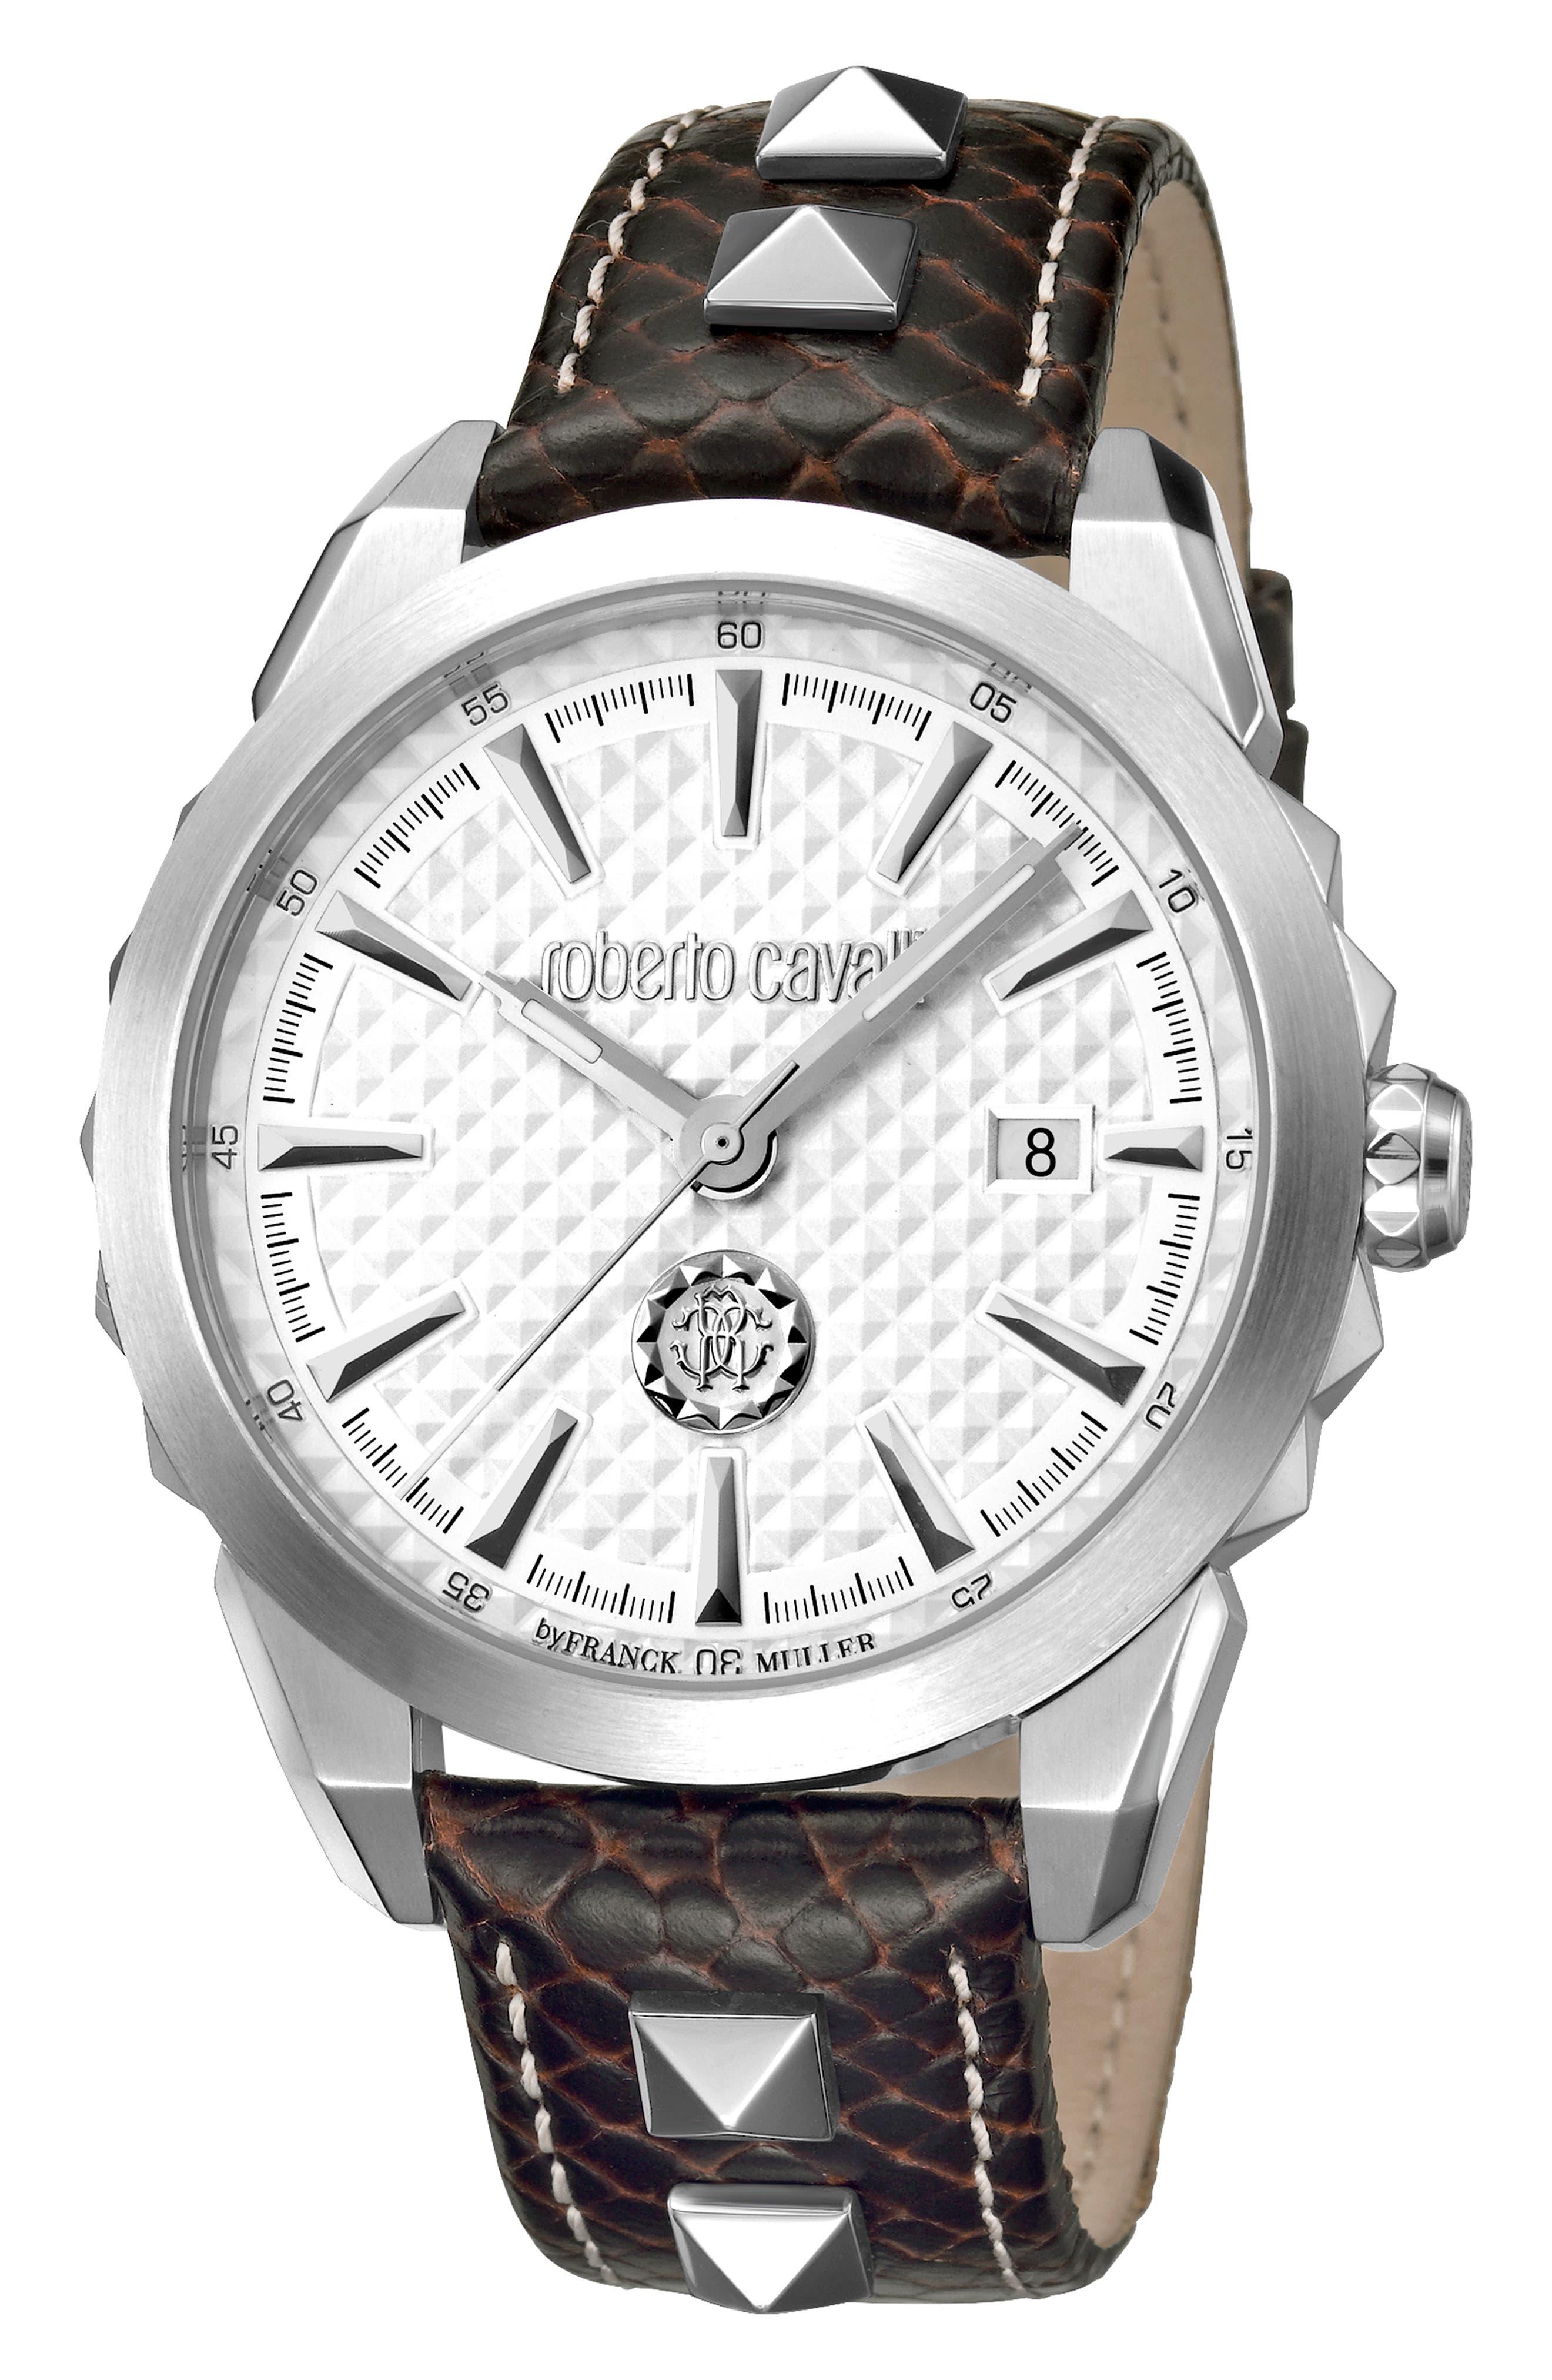 Costellato Leather Strap Watch,                         Main,                         color, BROWN/ SILVER